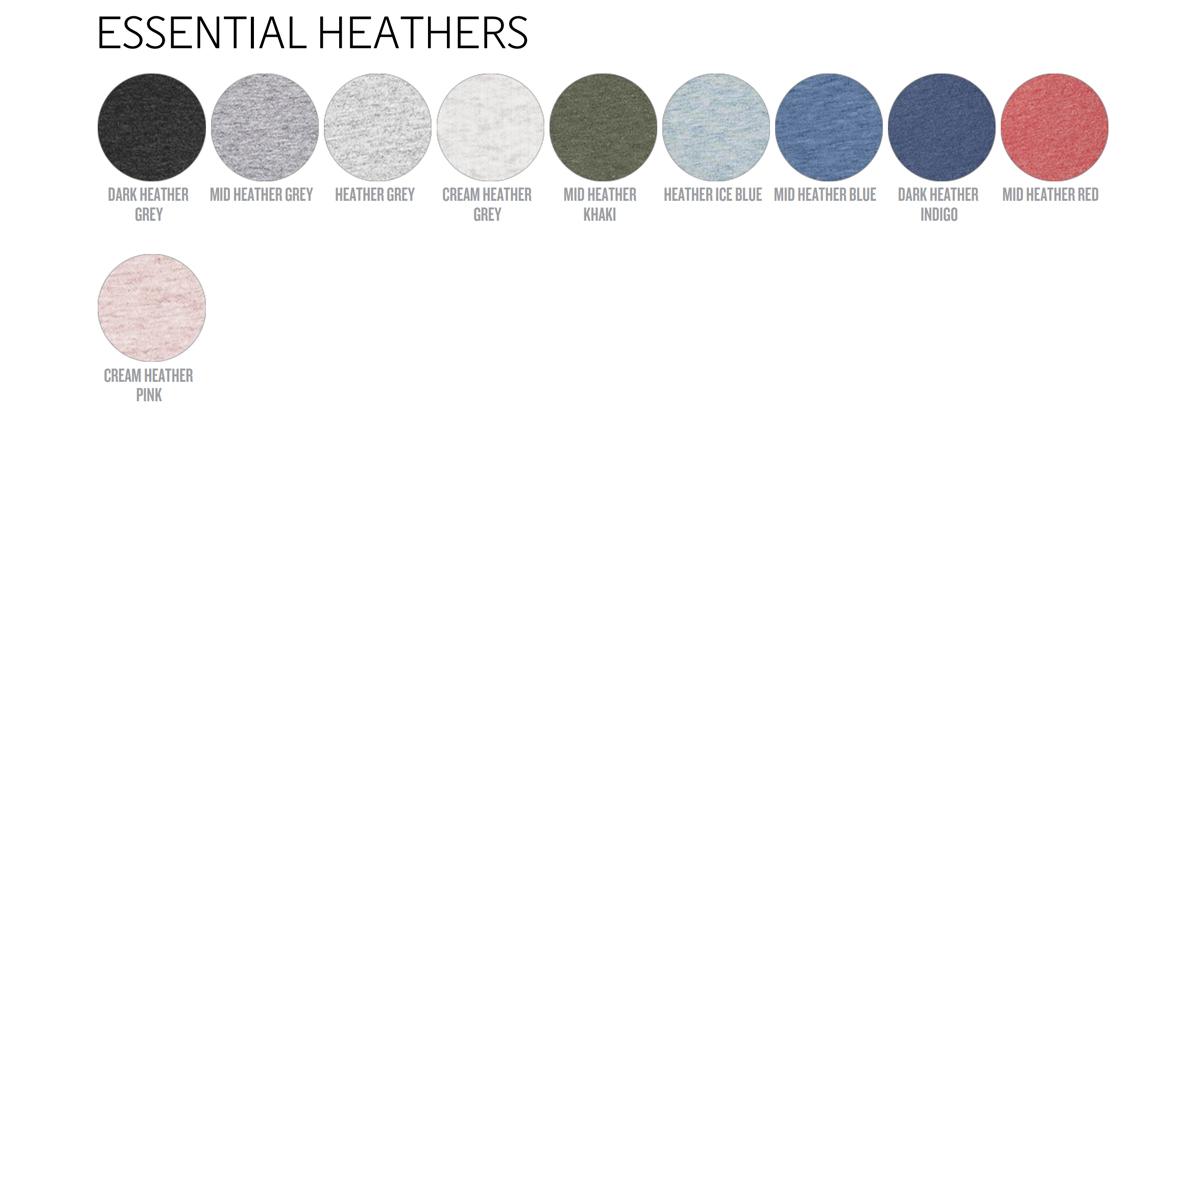 Essential heathers